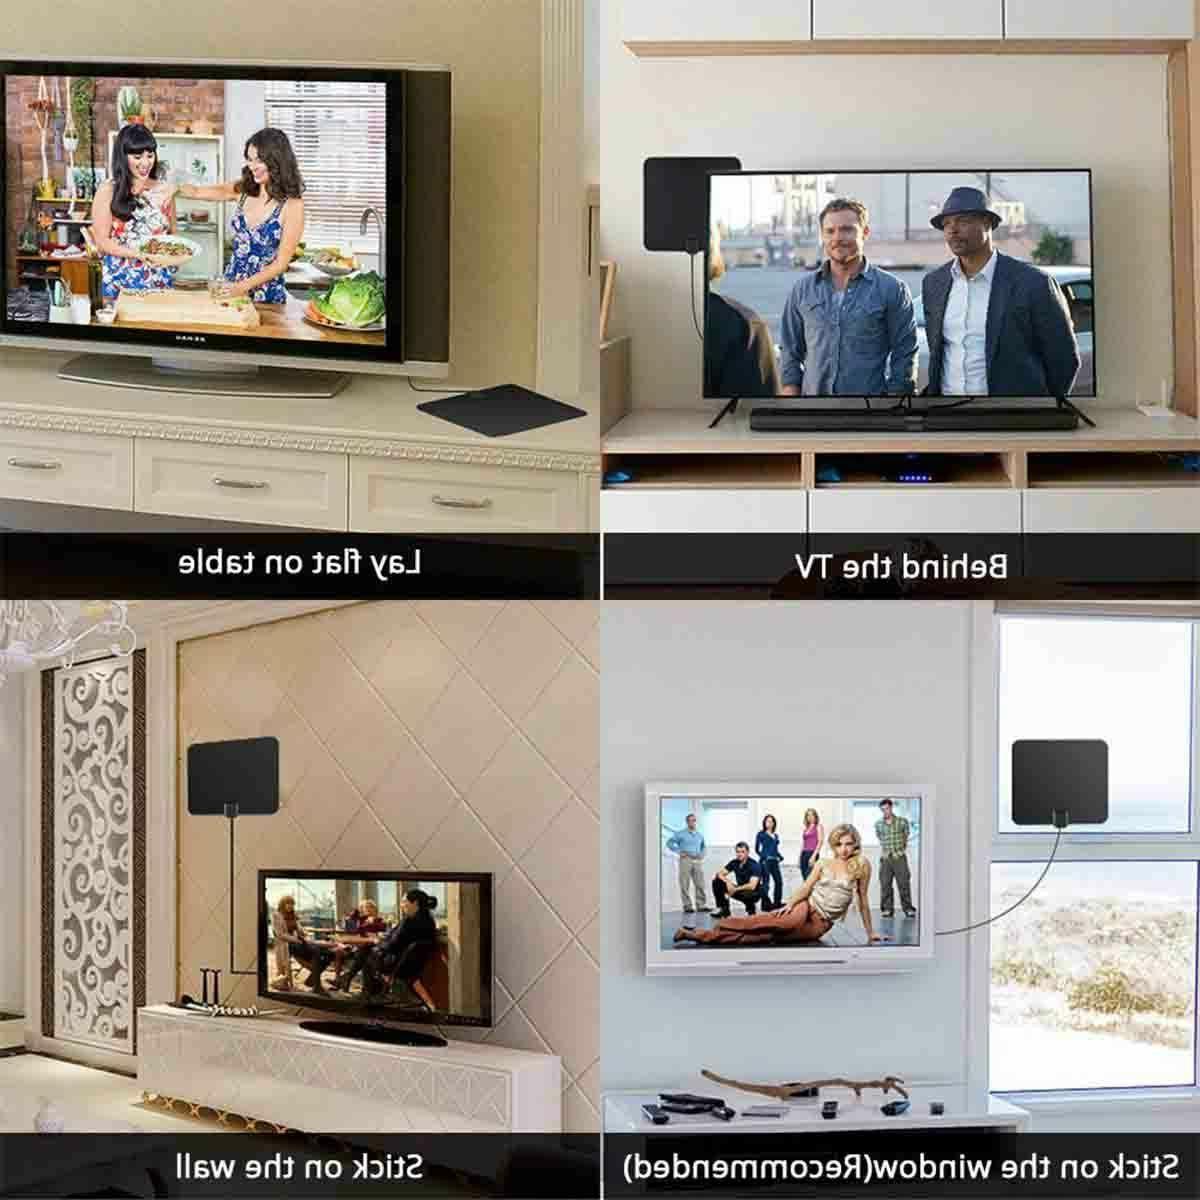 SUPER ANTENNA TVFOX HIGH DEFINITION HDTV MILES